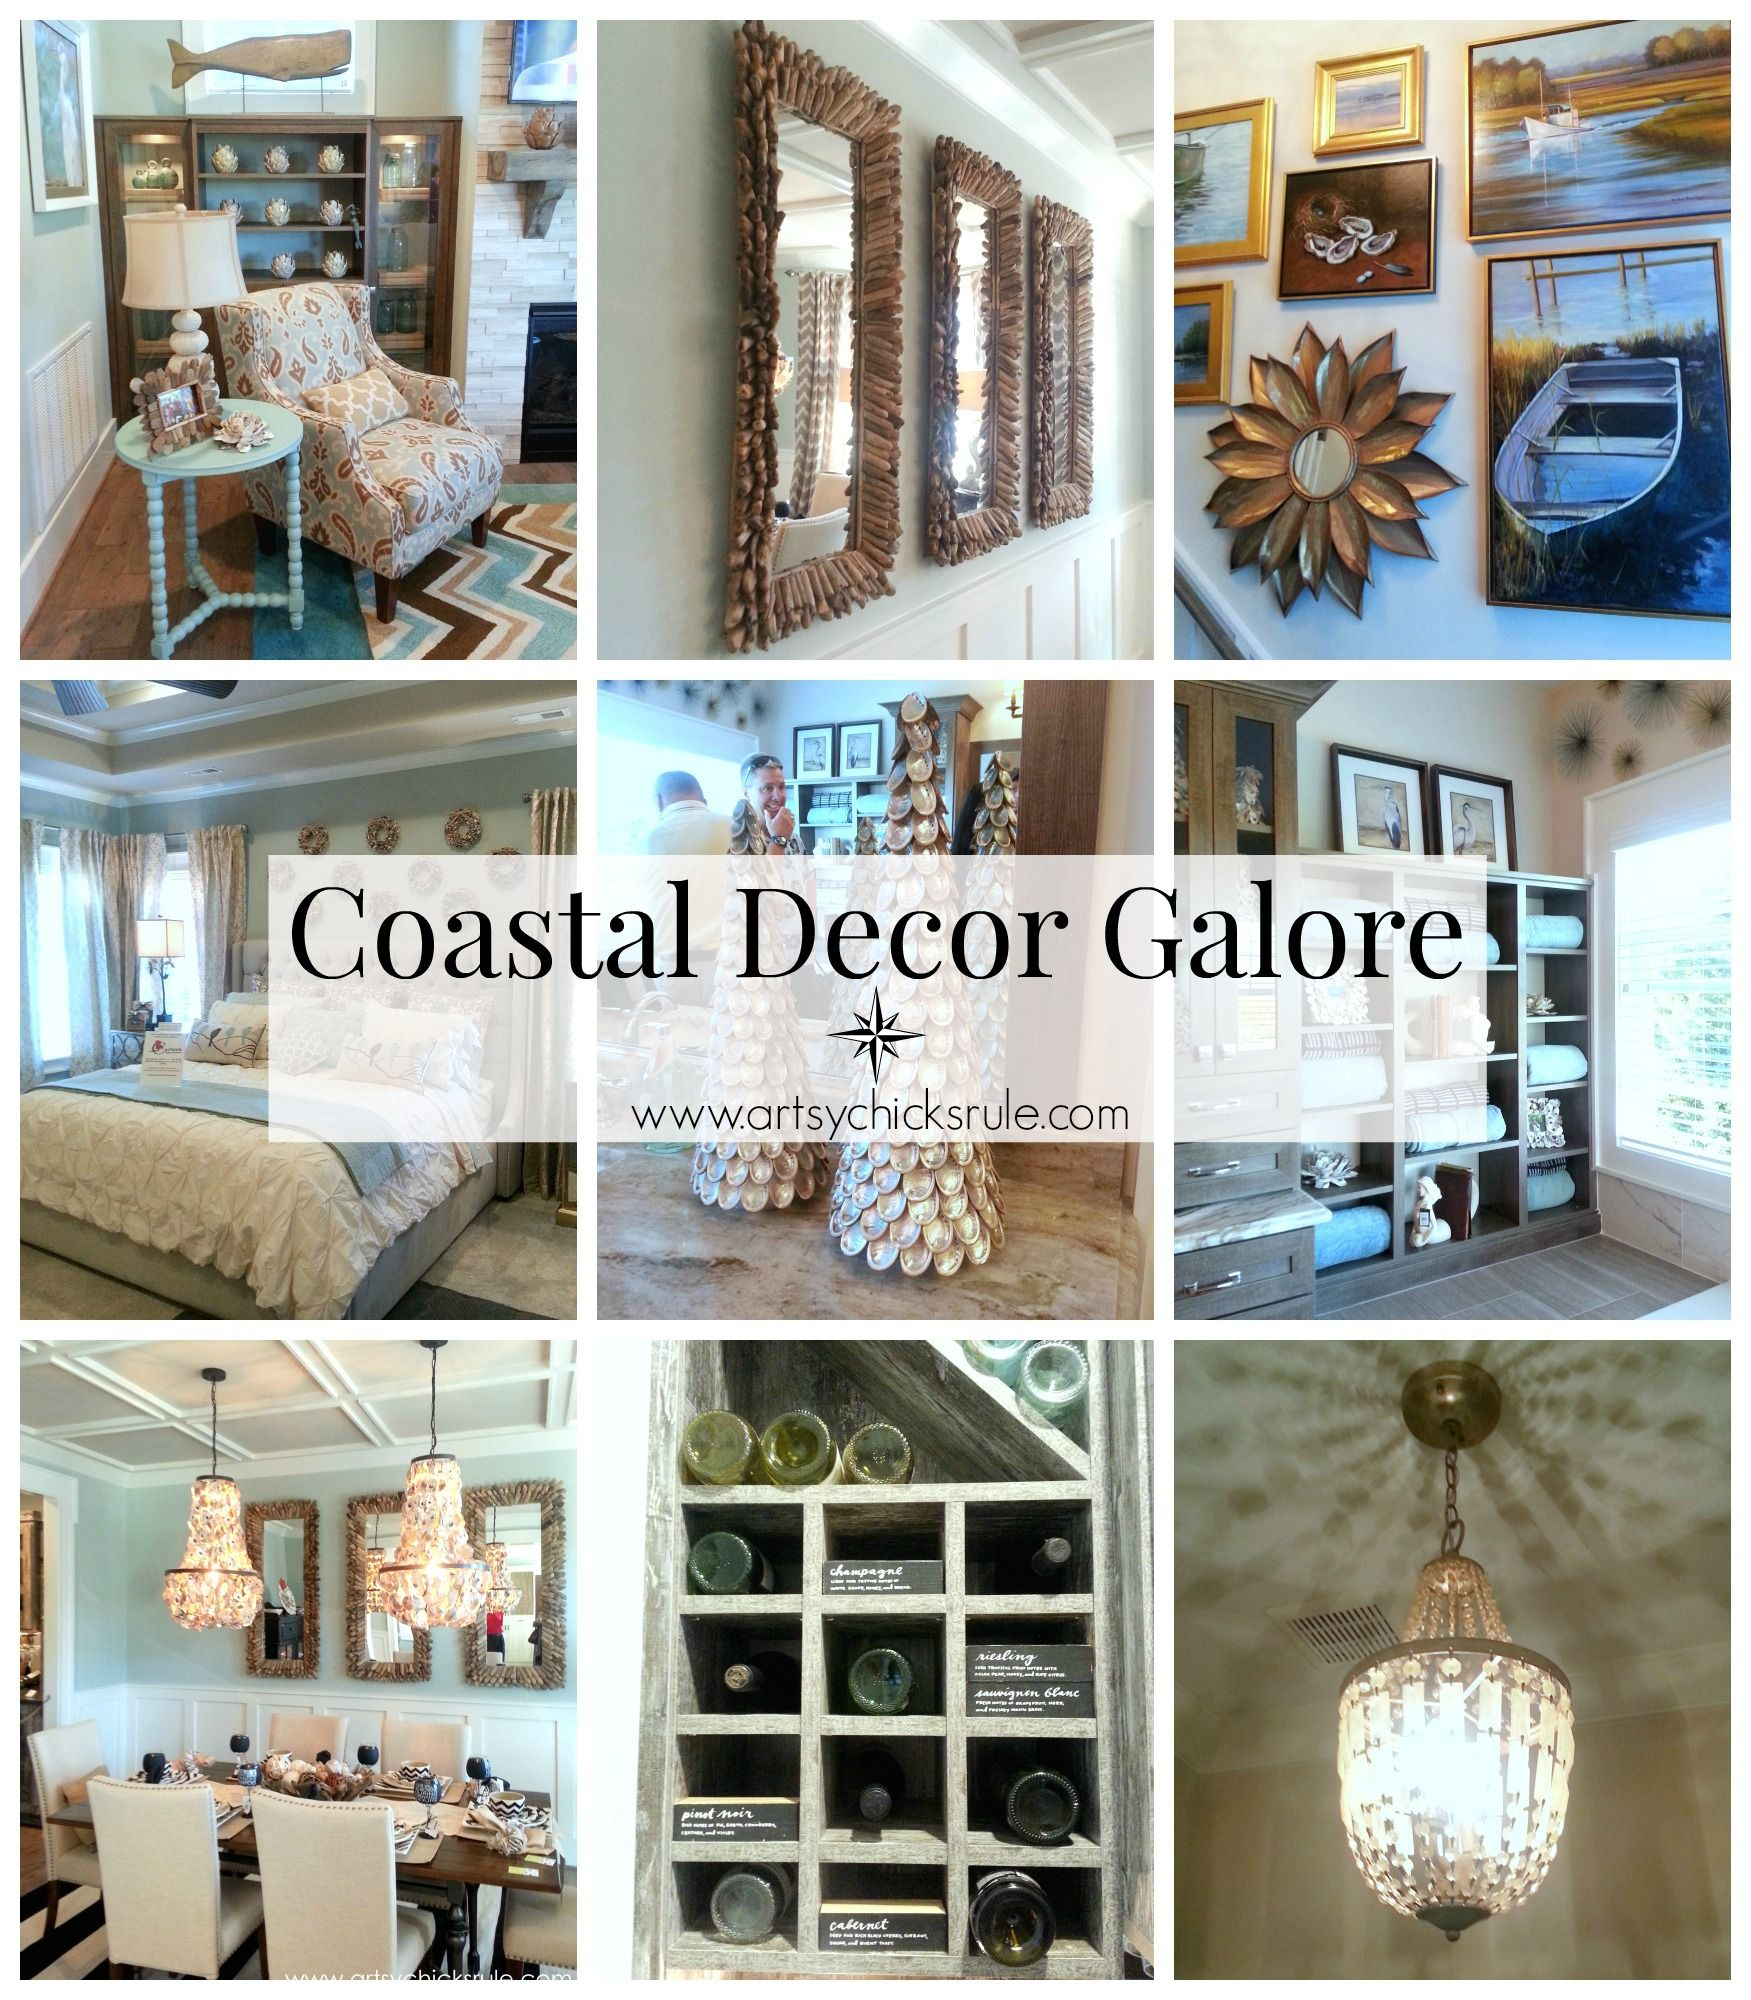 Coastal Decor Galore with tons of Inspiration